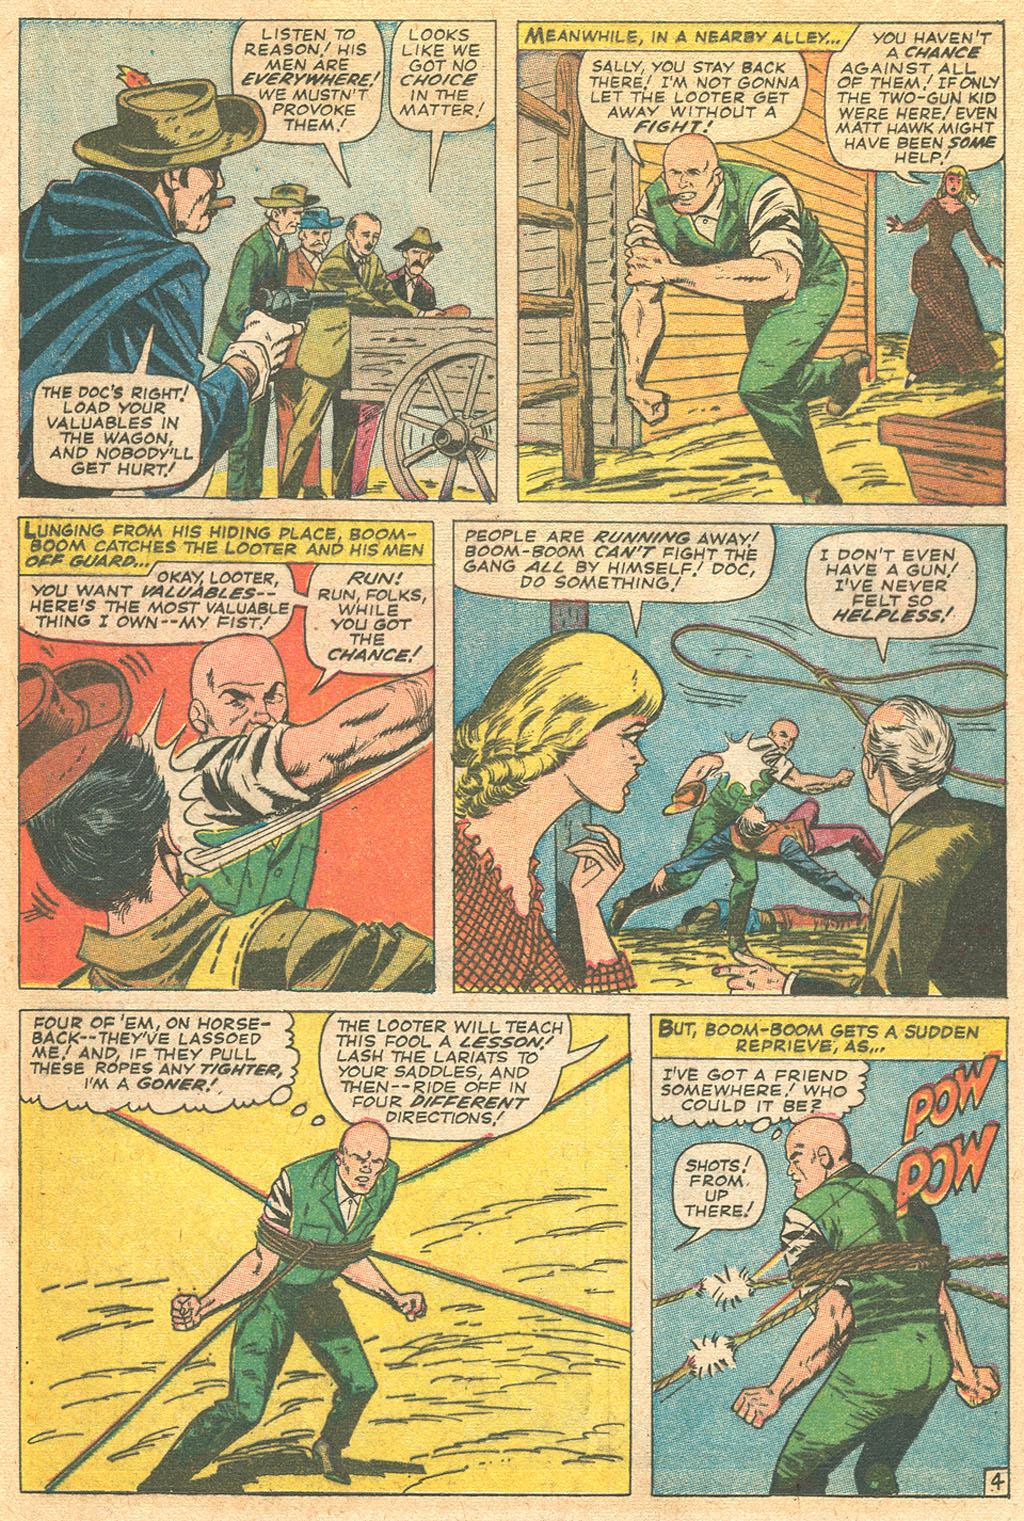 Read online Two-Gun Kid comic -  Issue #86 - 17